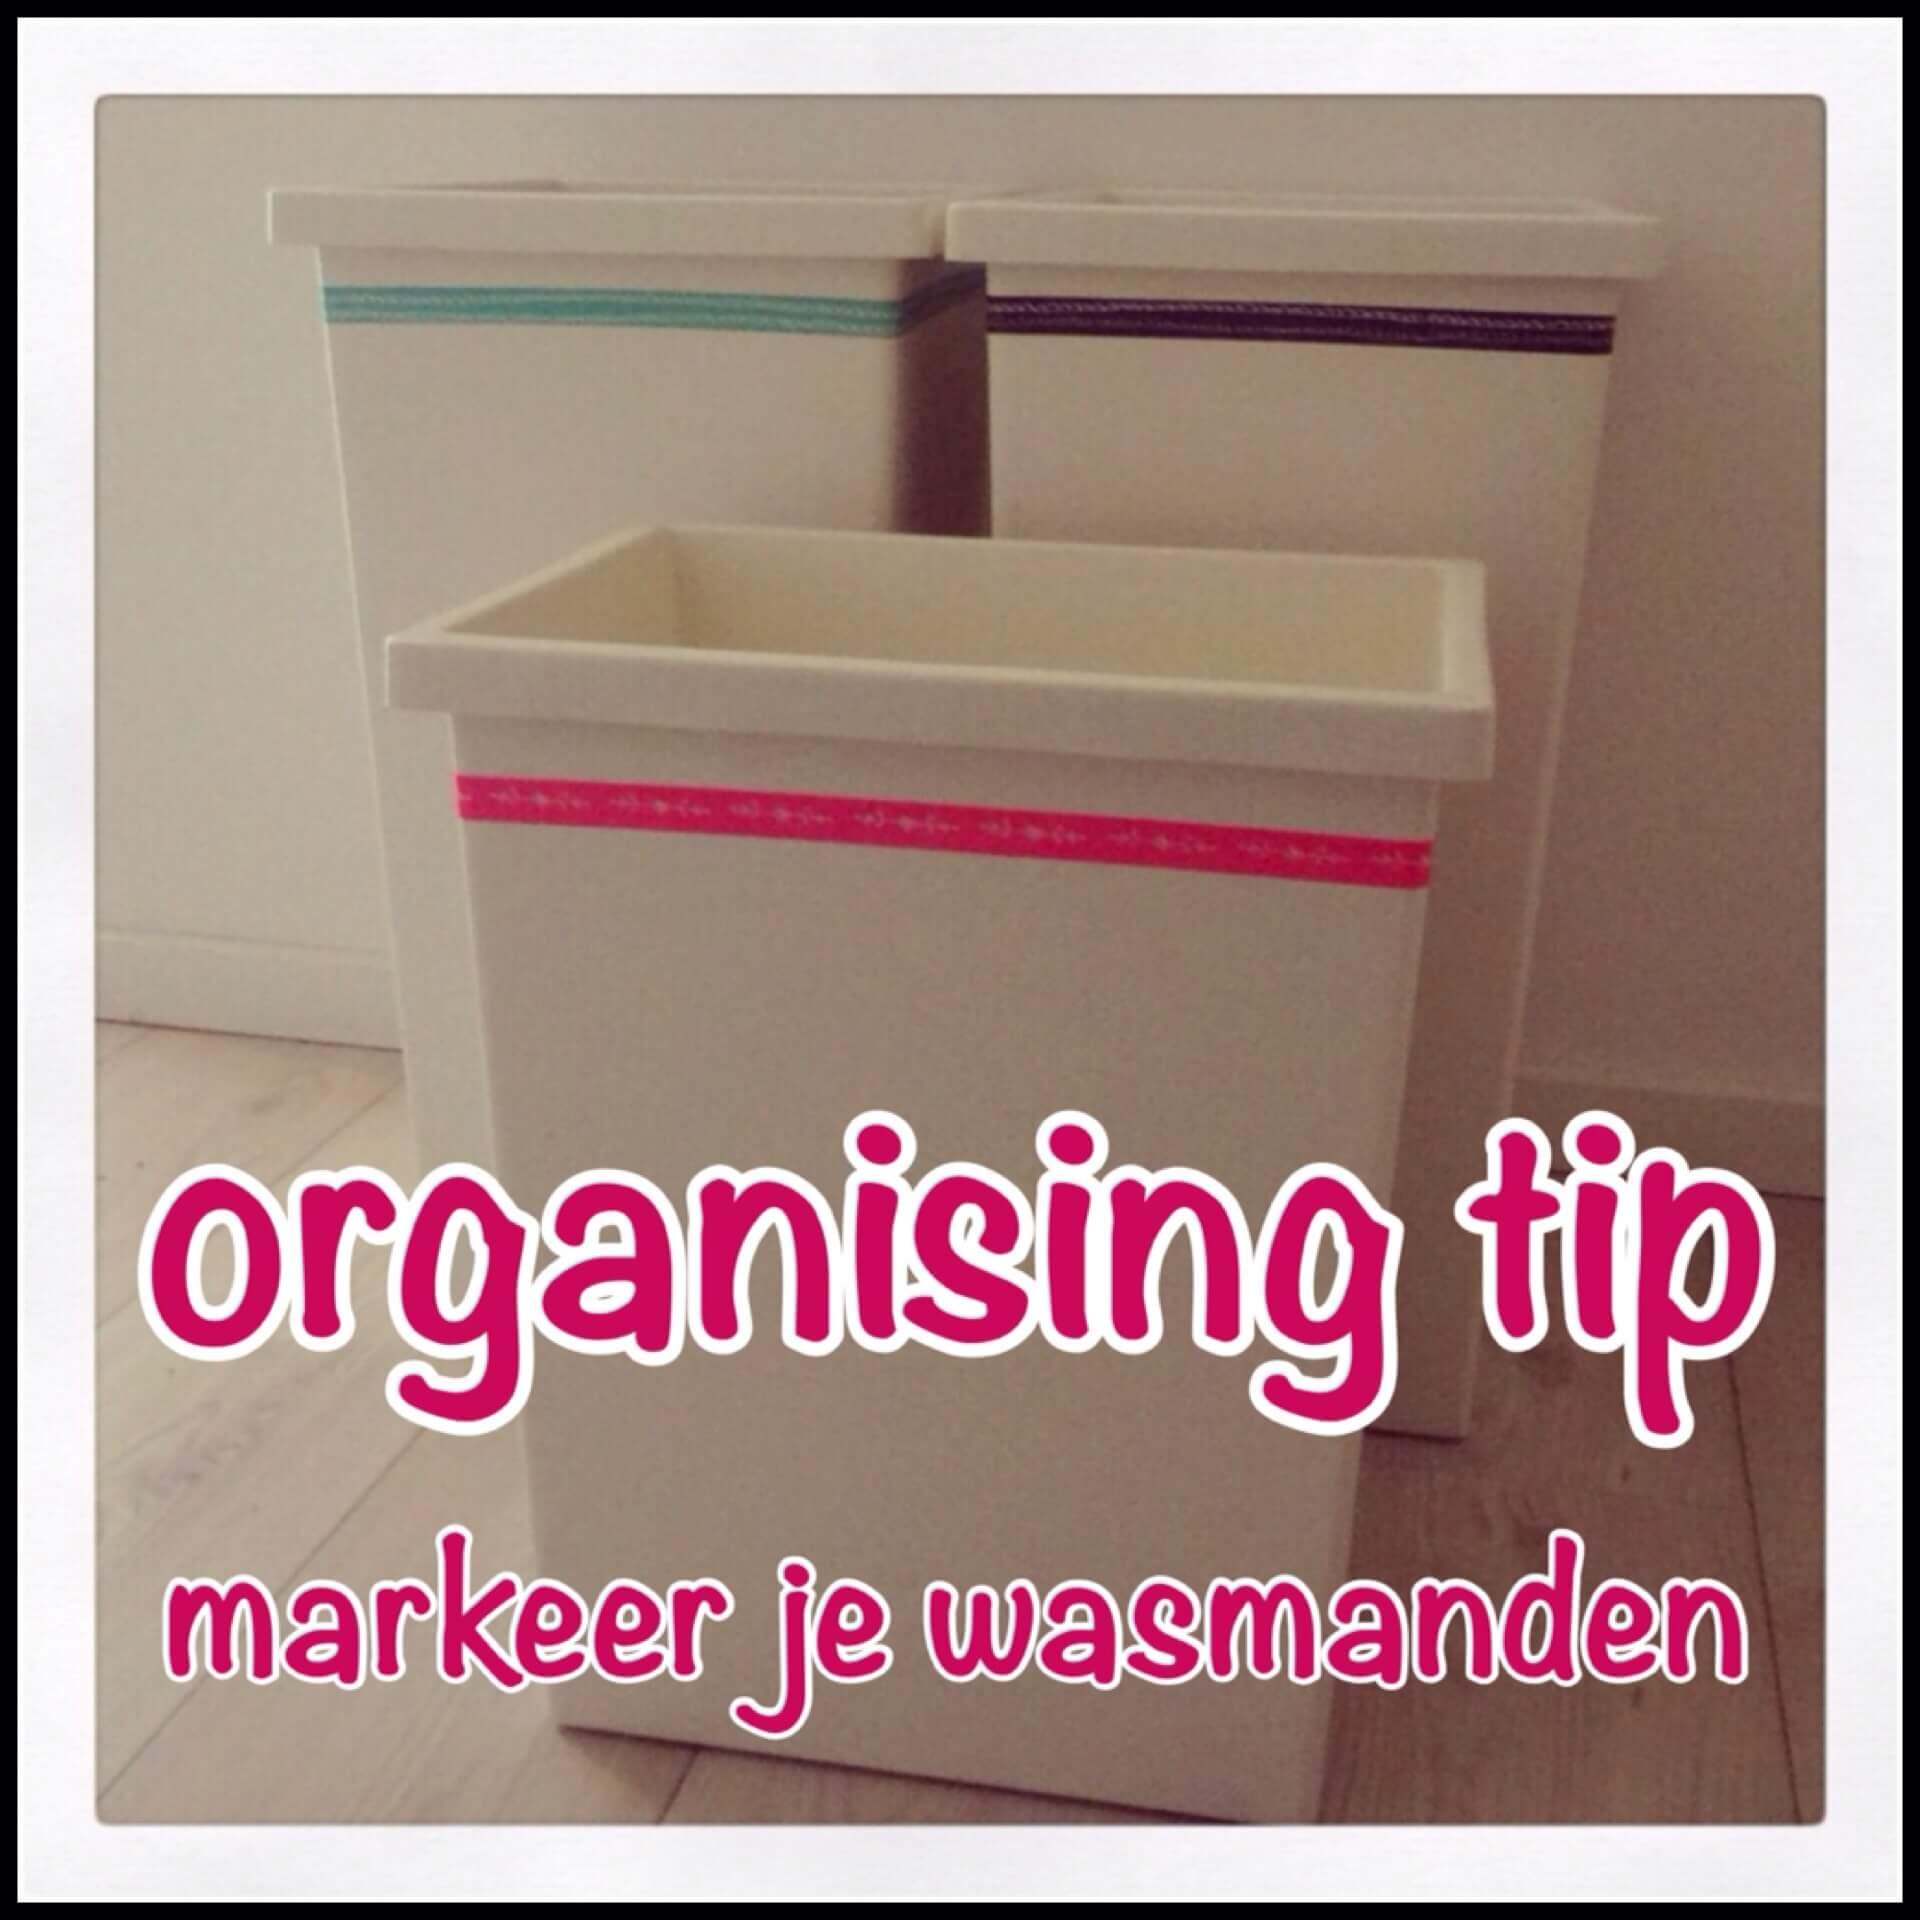 Organising tip: markeer je wasmanden